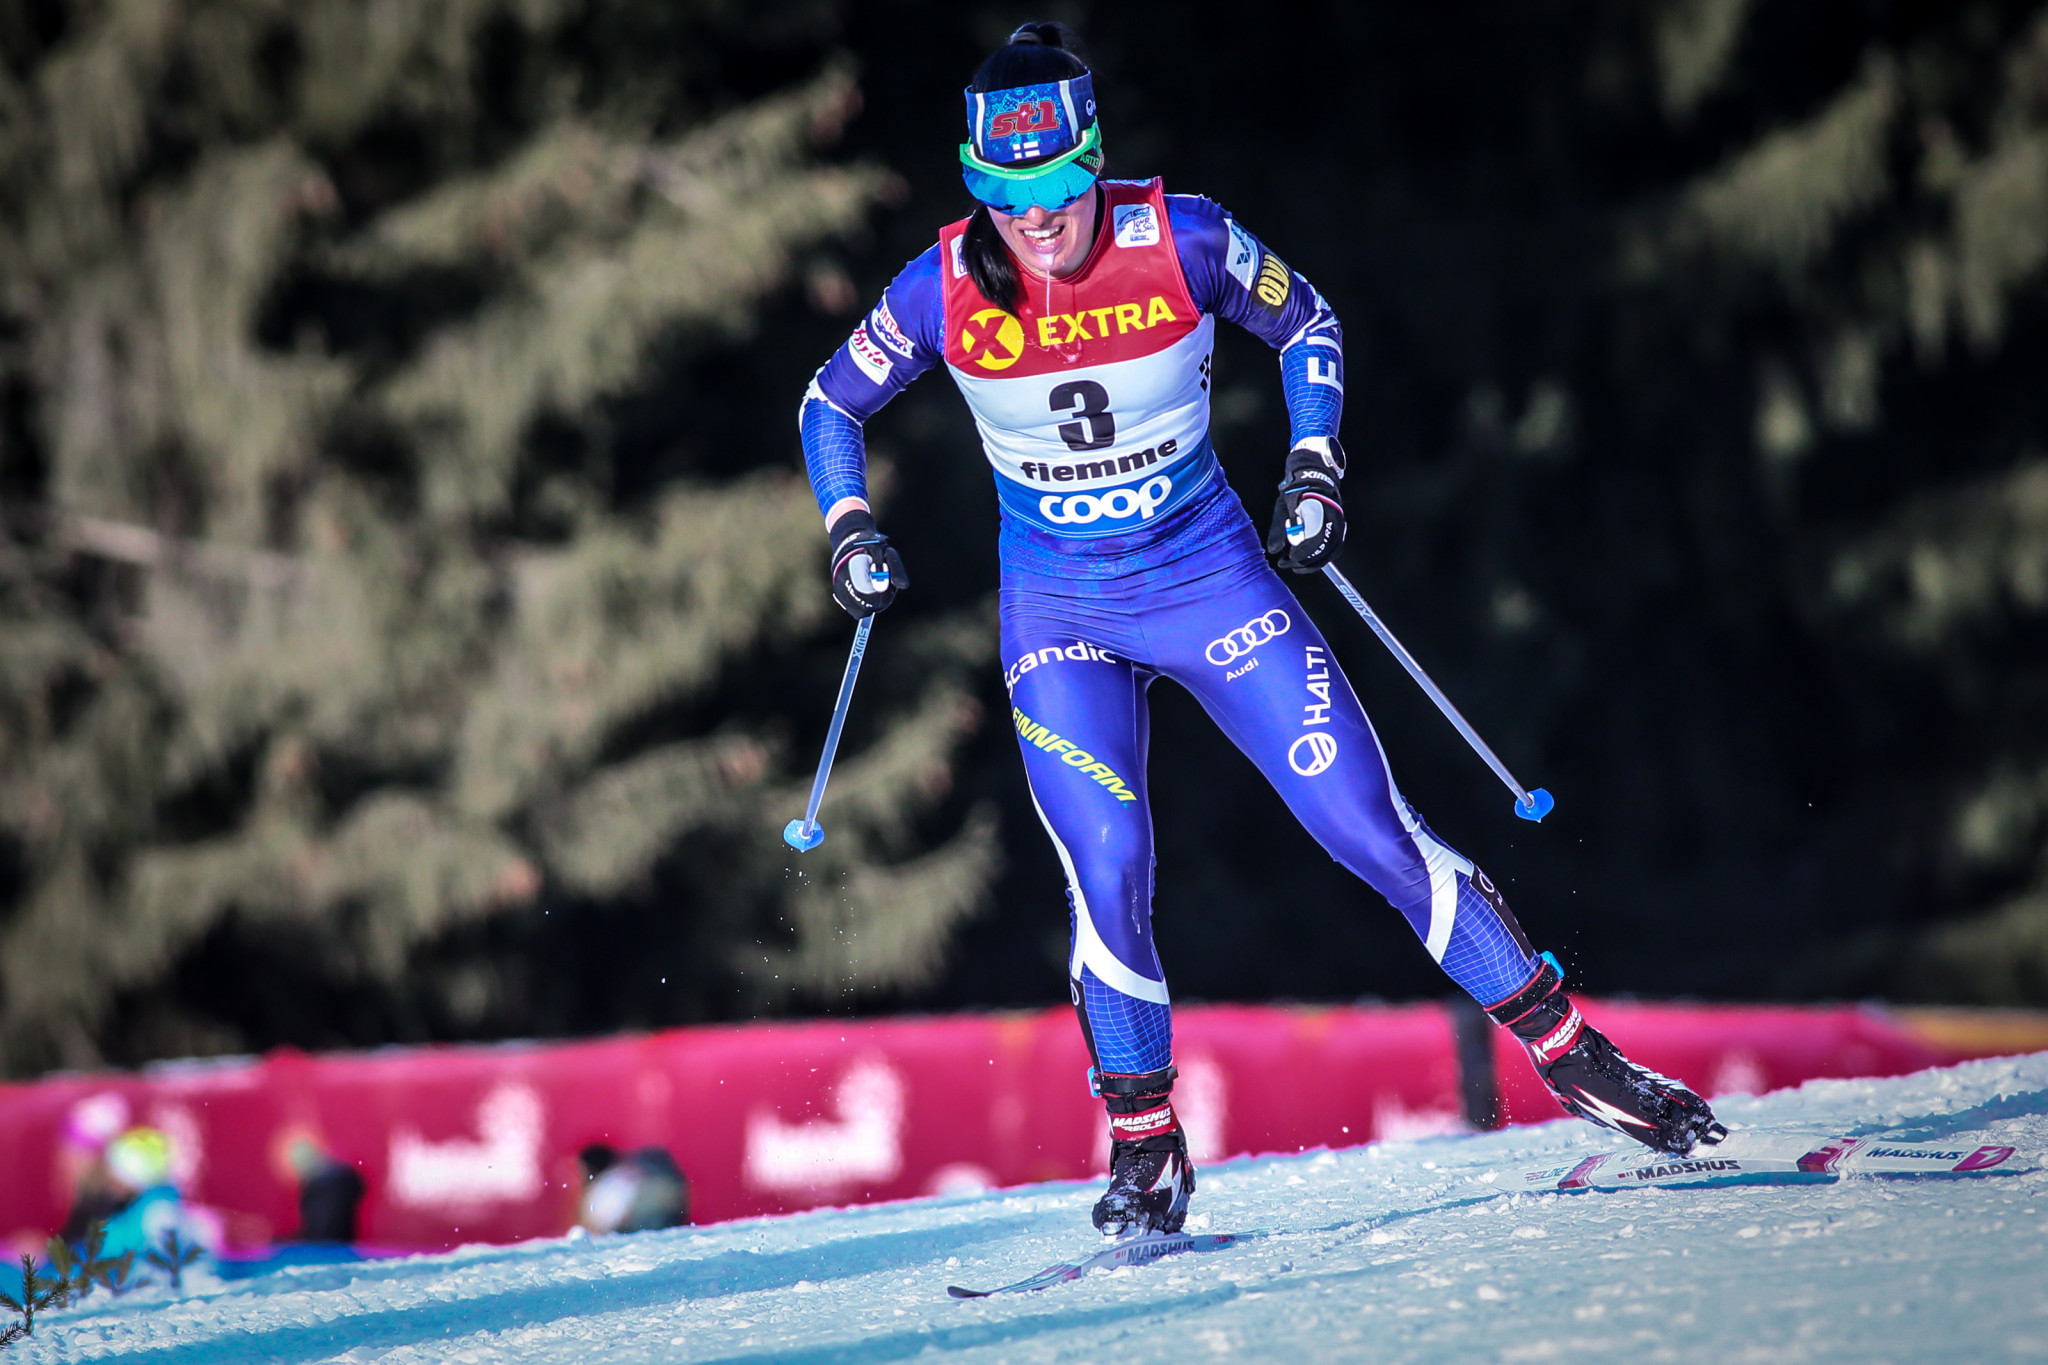 Krista Pärmäkoski has won six World Championship medals ©Getty Images